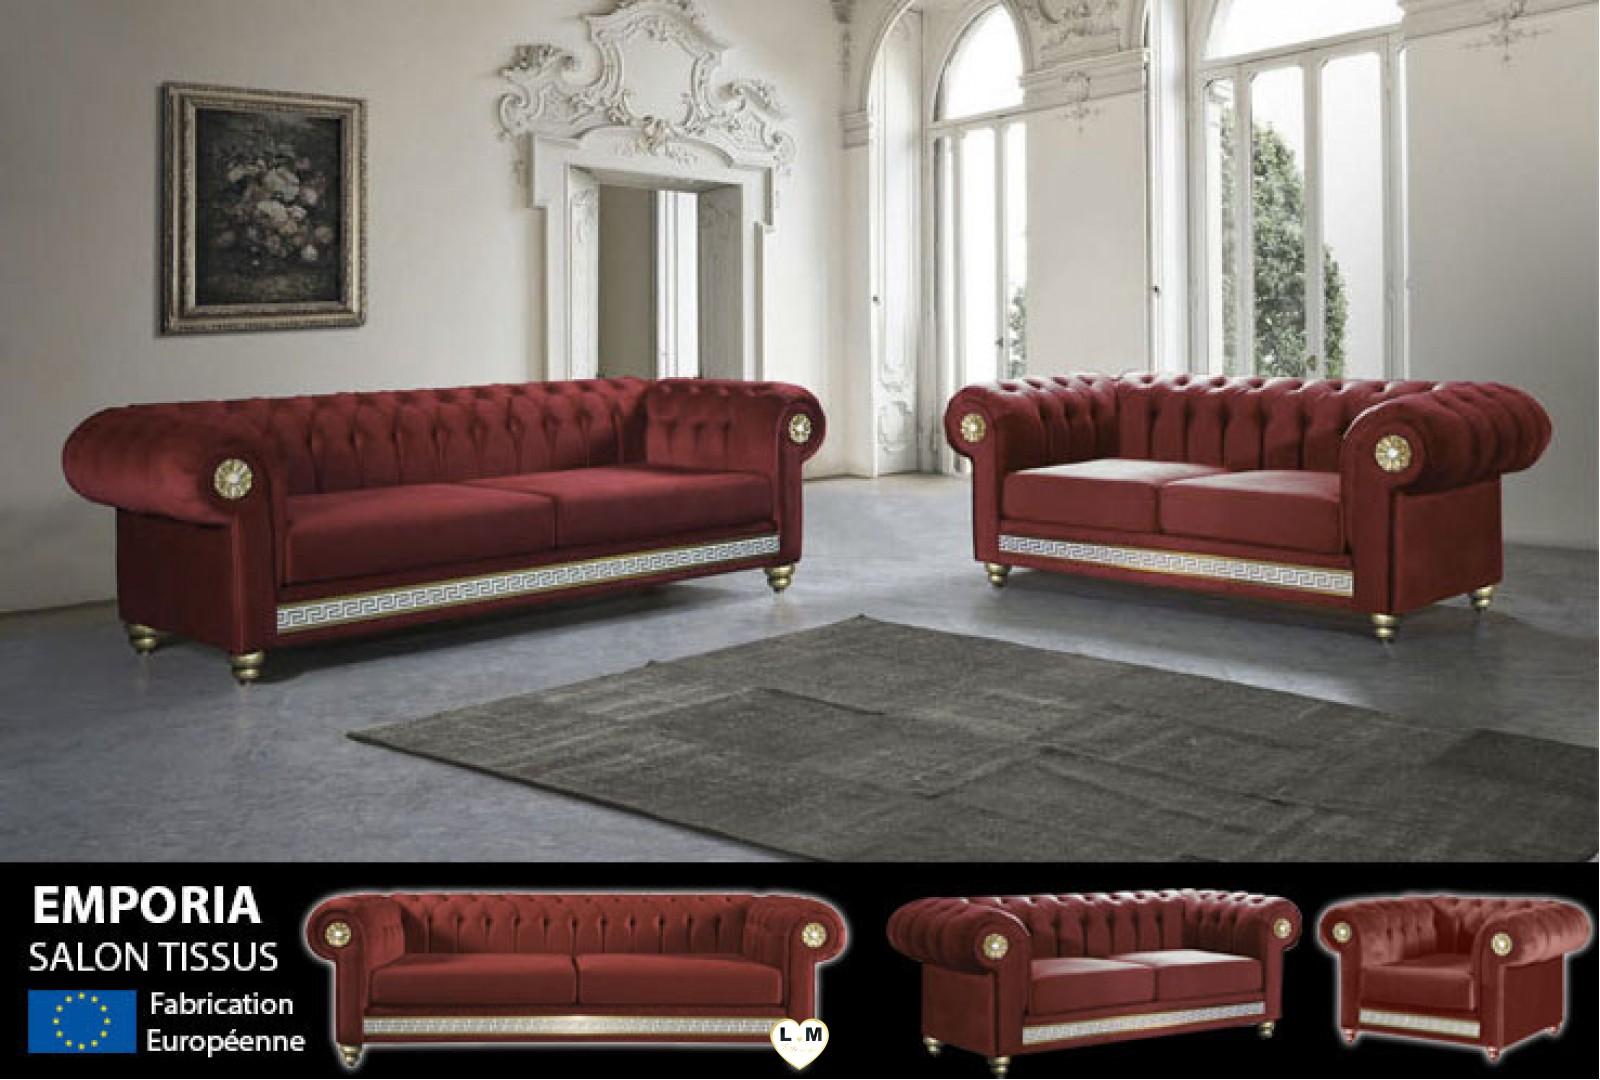 chesterfield emporia line ensemble salon tissus rouge lignemeuble com. Black Bedroom Furniture Sets. Home Design Ideas